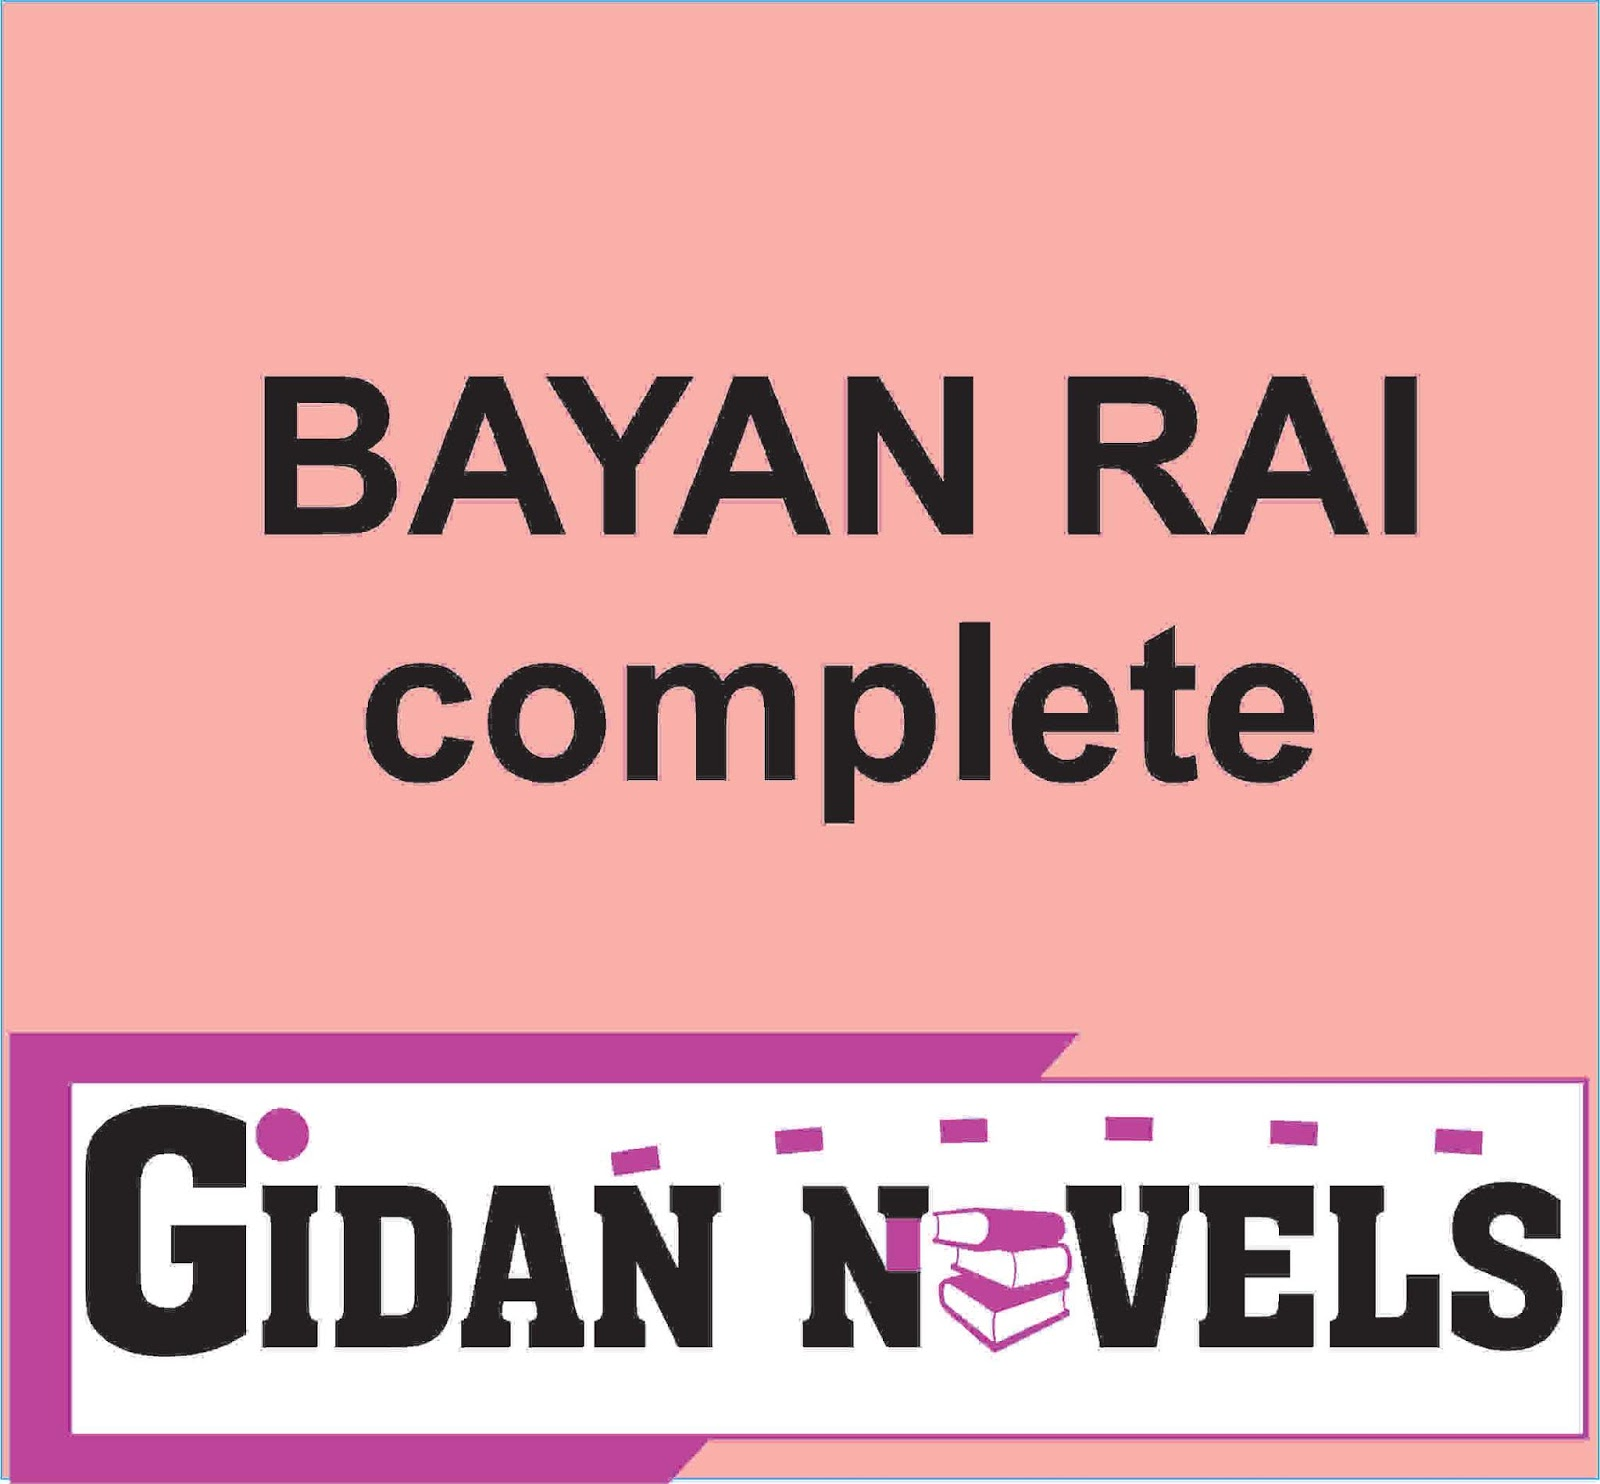 BAYAN RAI COMPLETE SHORT HAUSA STORY - Gidan Novels | Hausa Novels